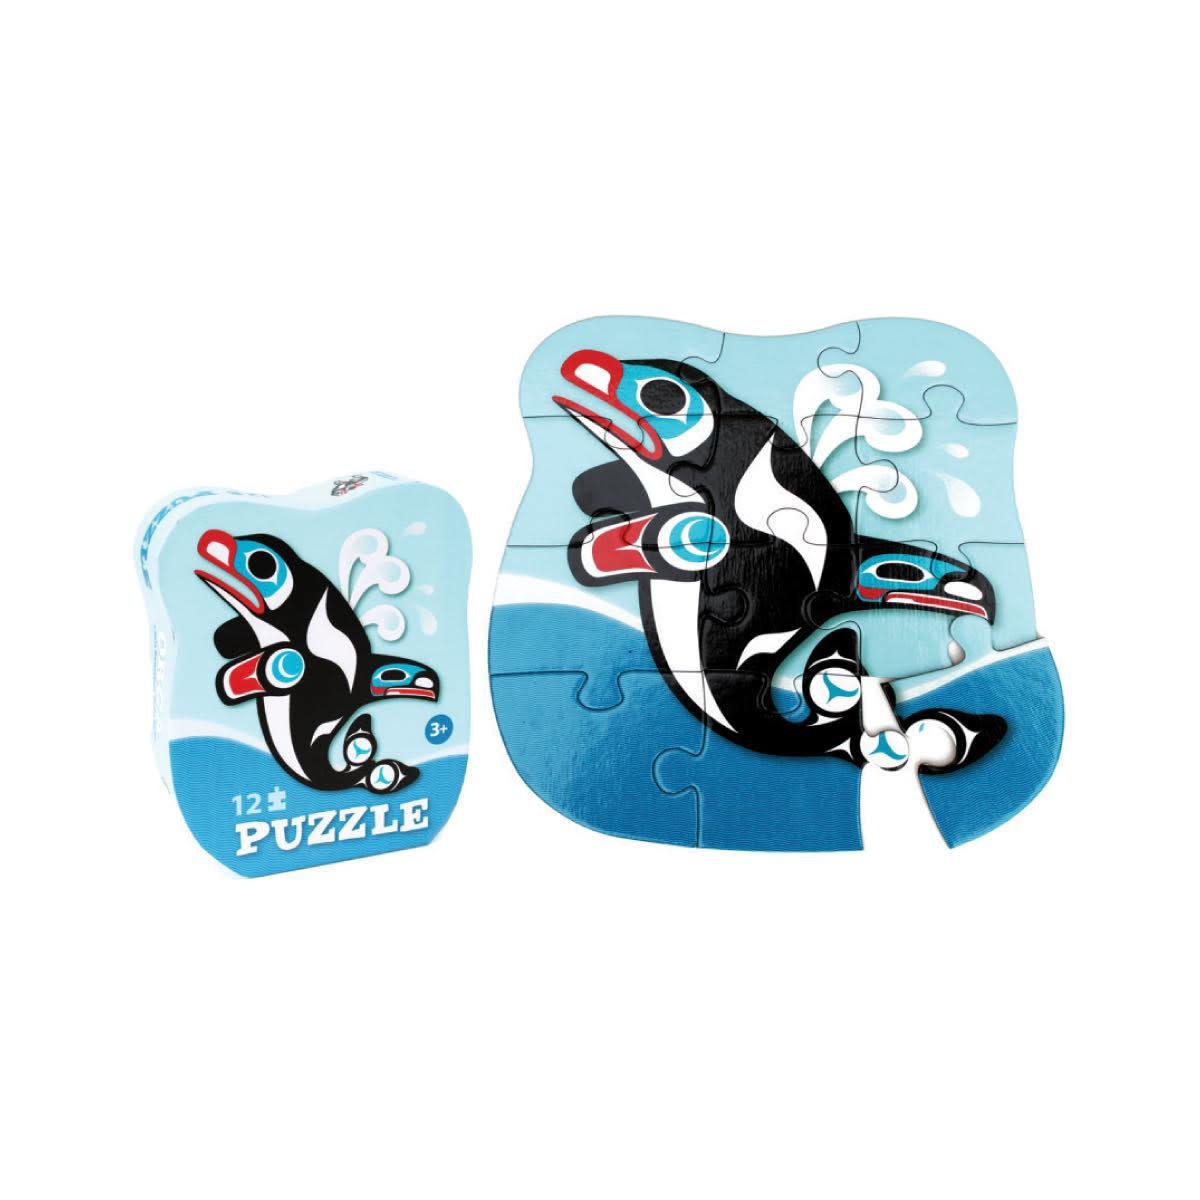 12 Piece Puzzle-Orca by Chris Kewistep-1